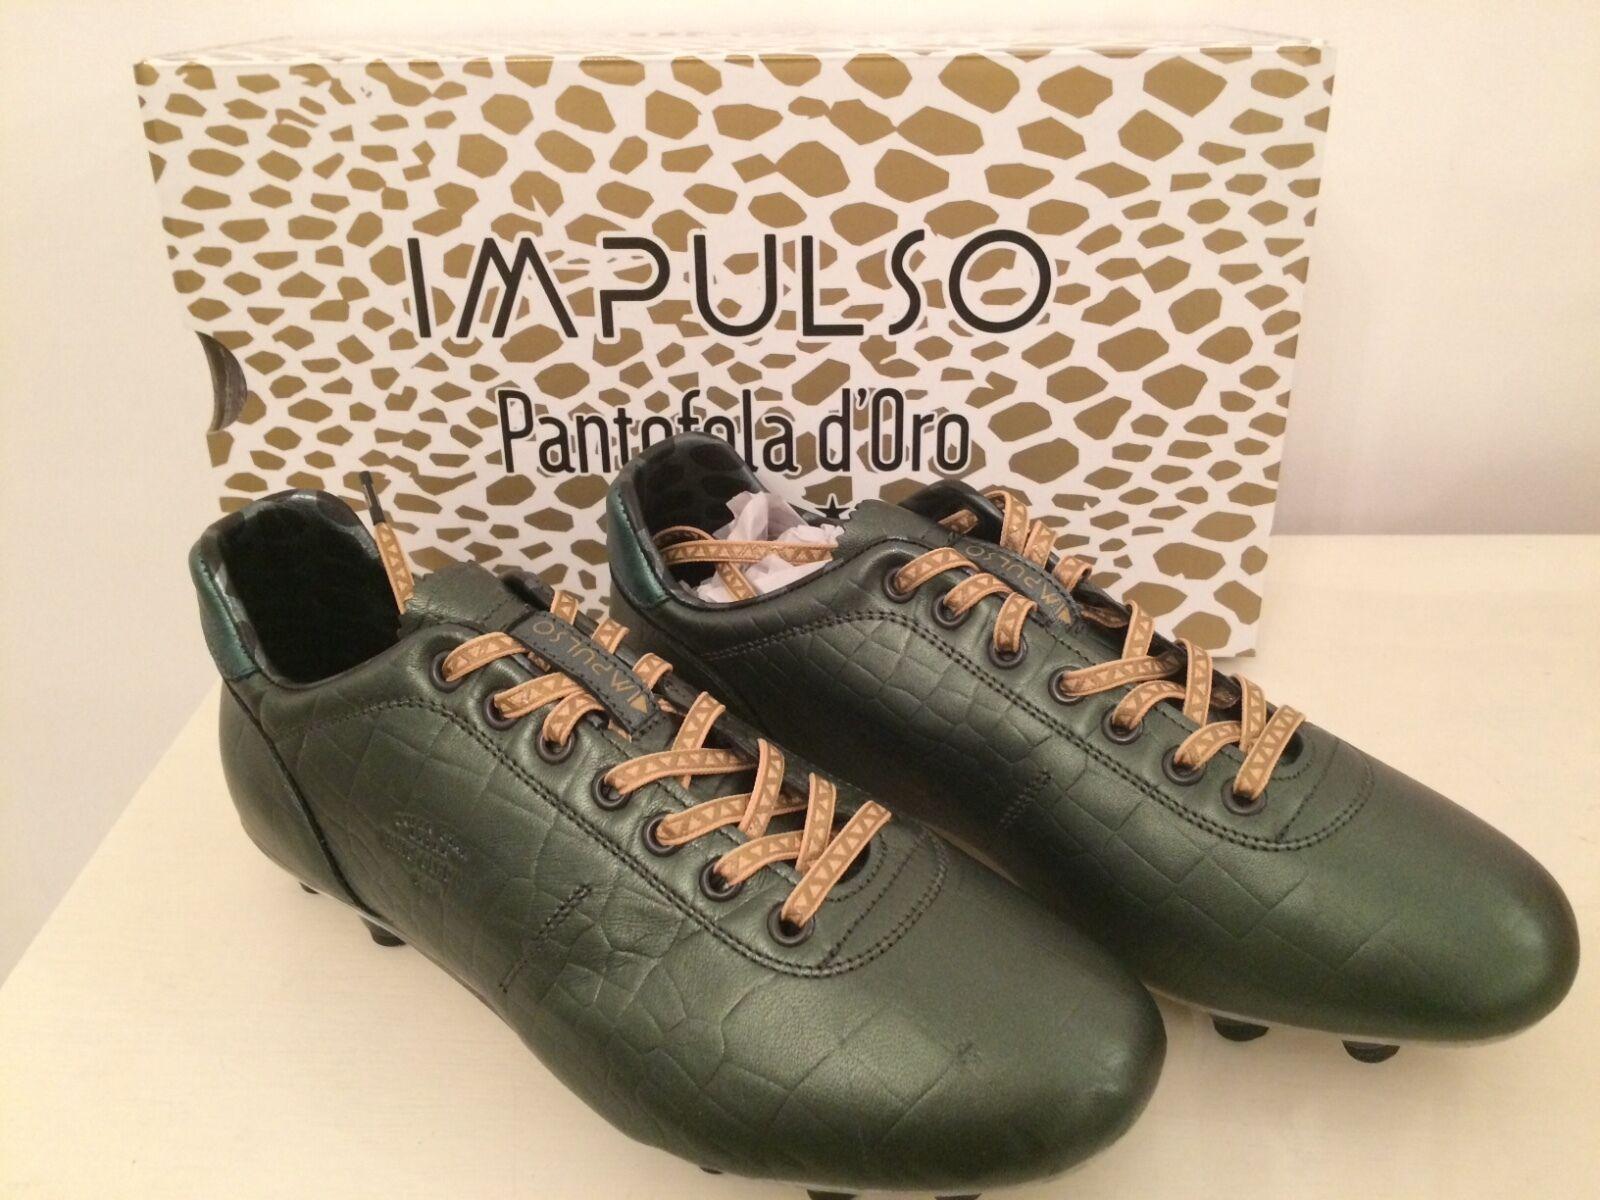 Impulso Pantofola d'Oro Größe 46 Euro New Cocco Nile Grün Football Studs